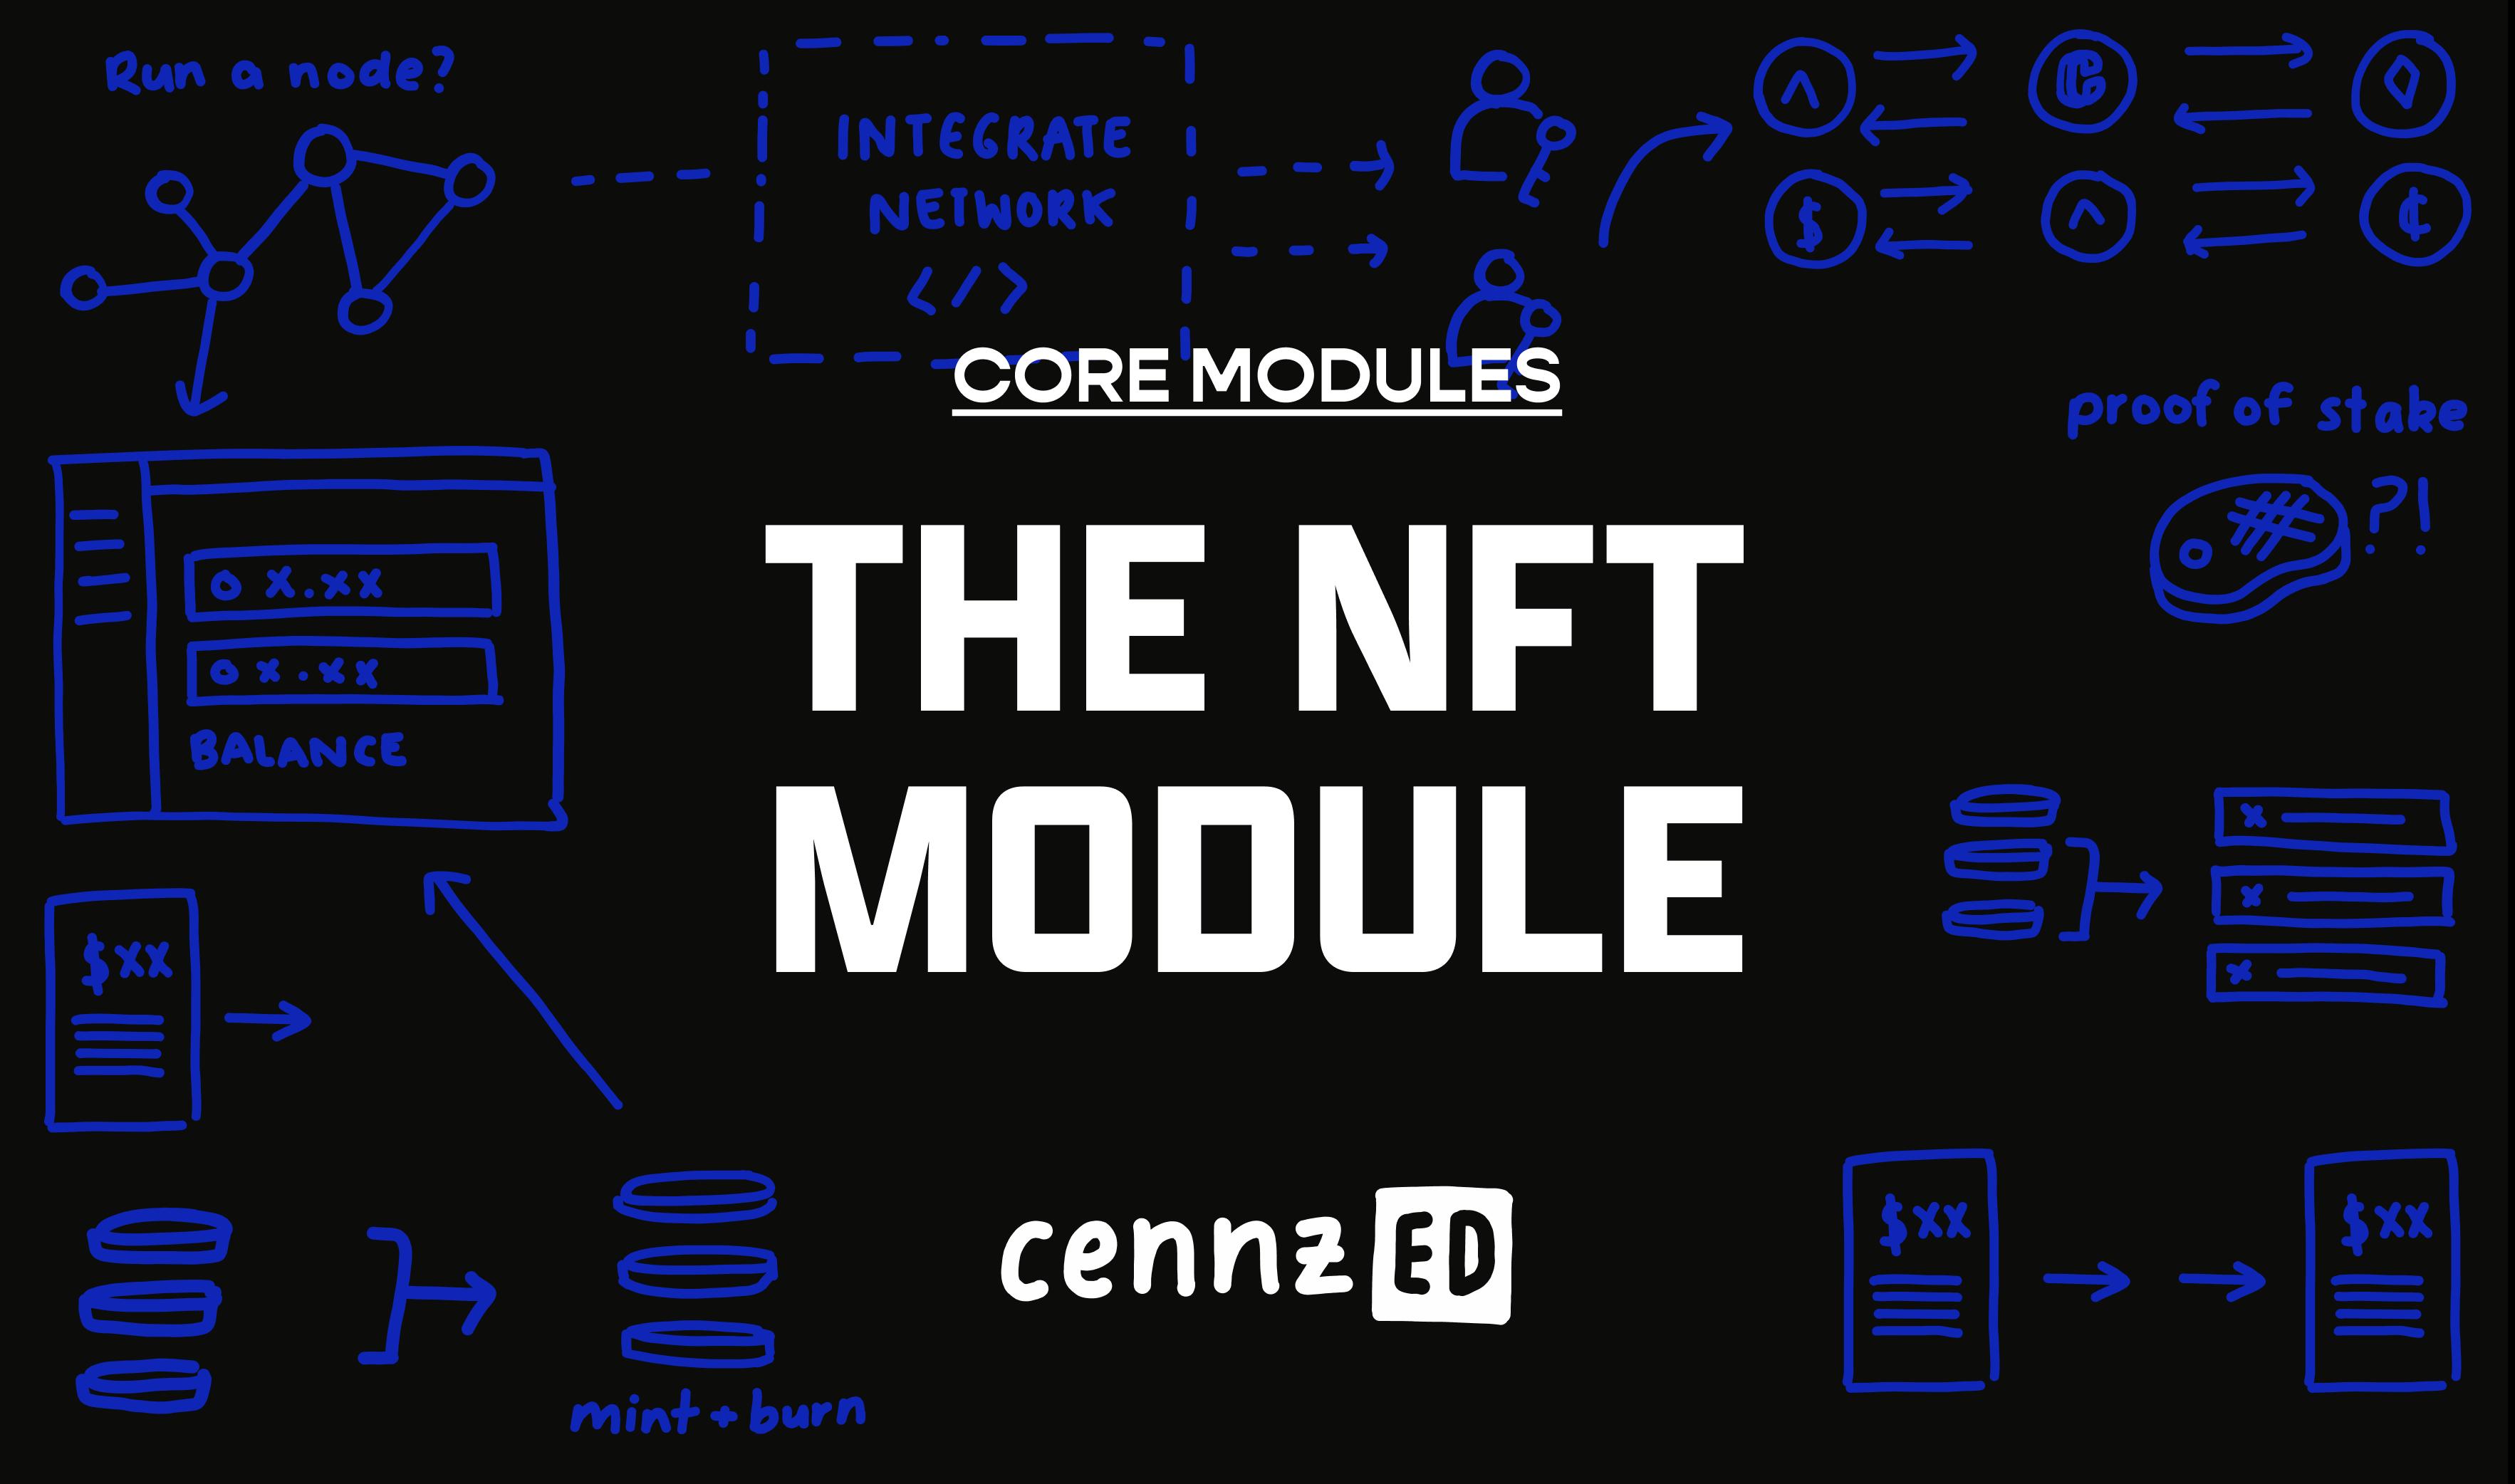 The NFT module